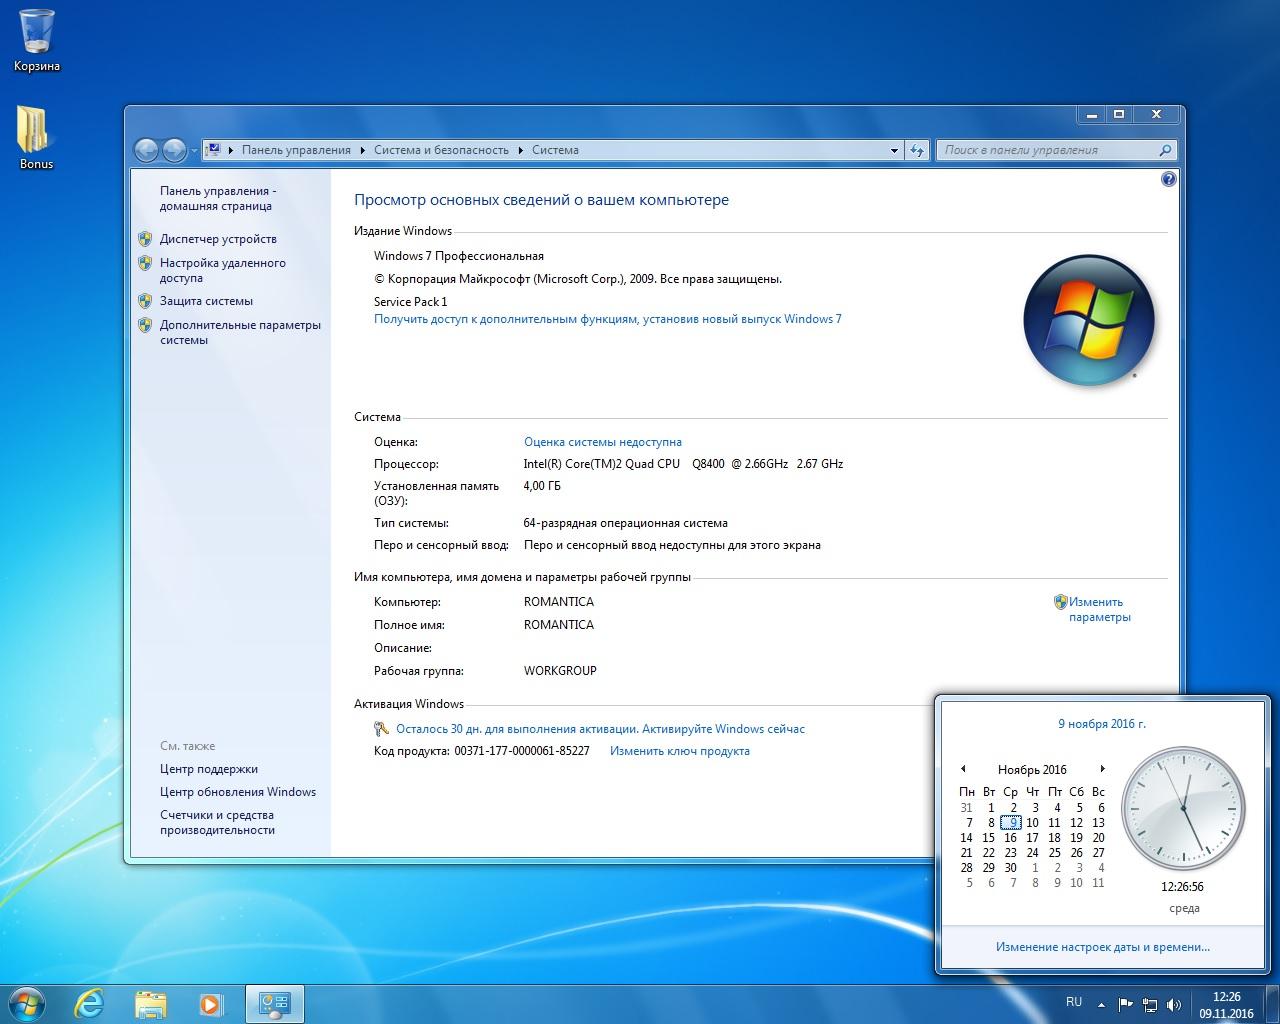 Windows xp sp3 volume license